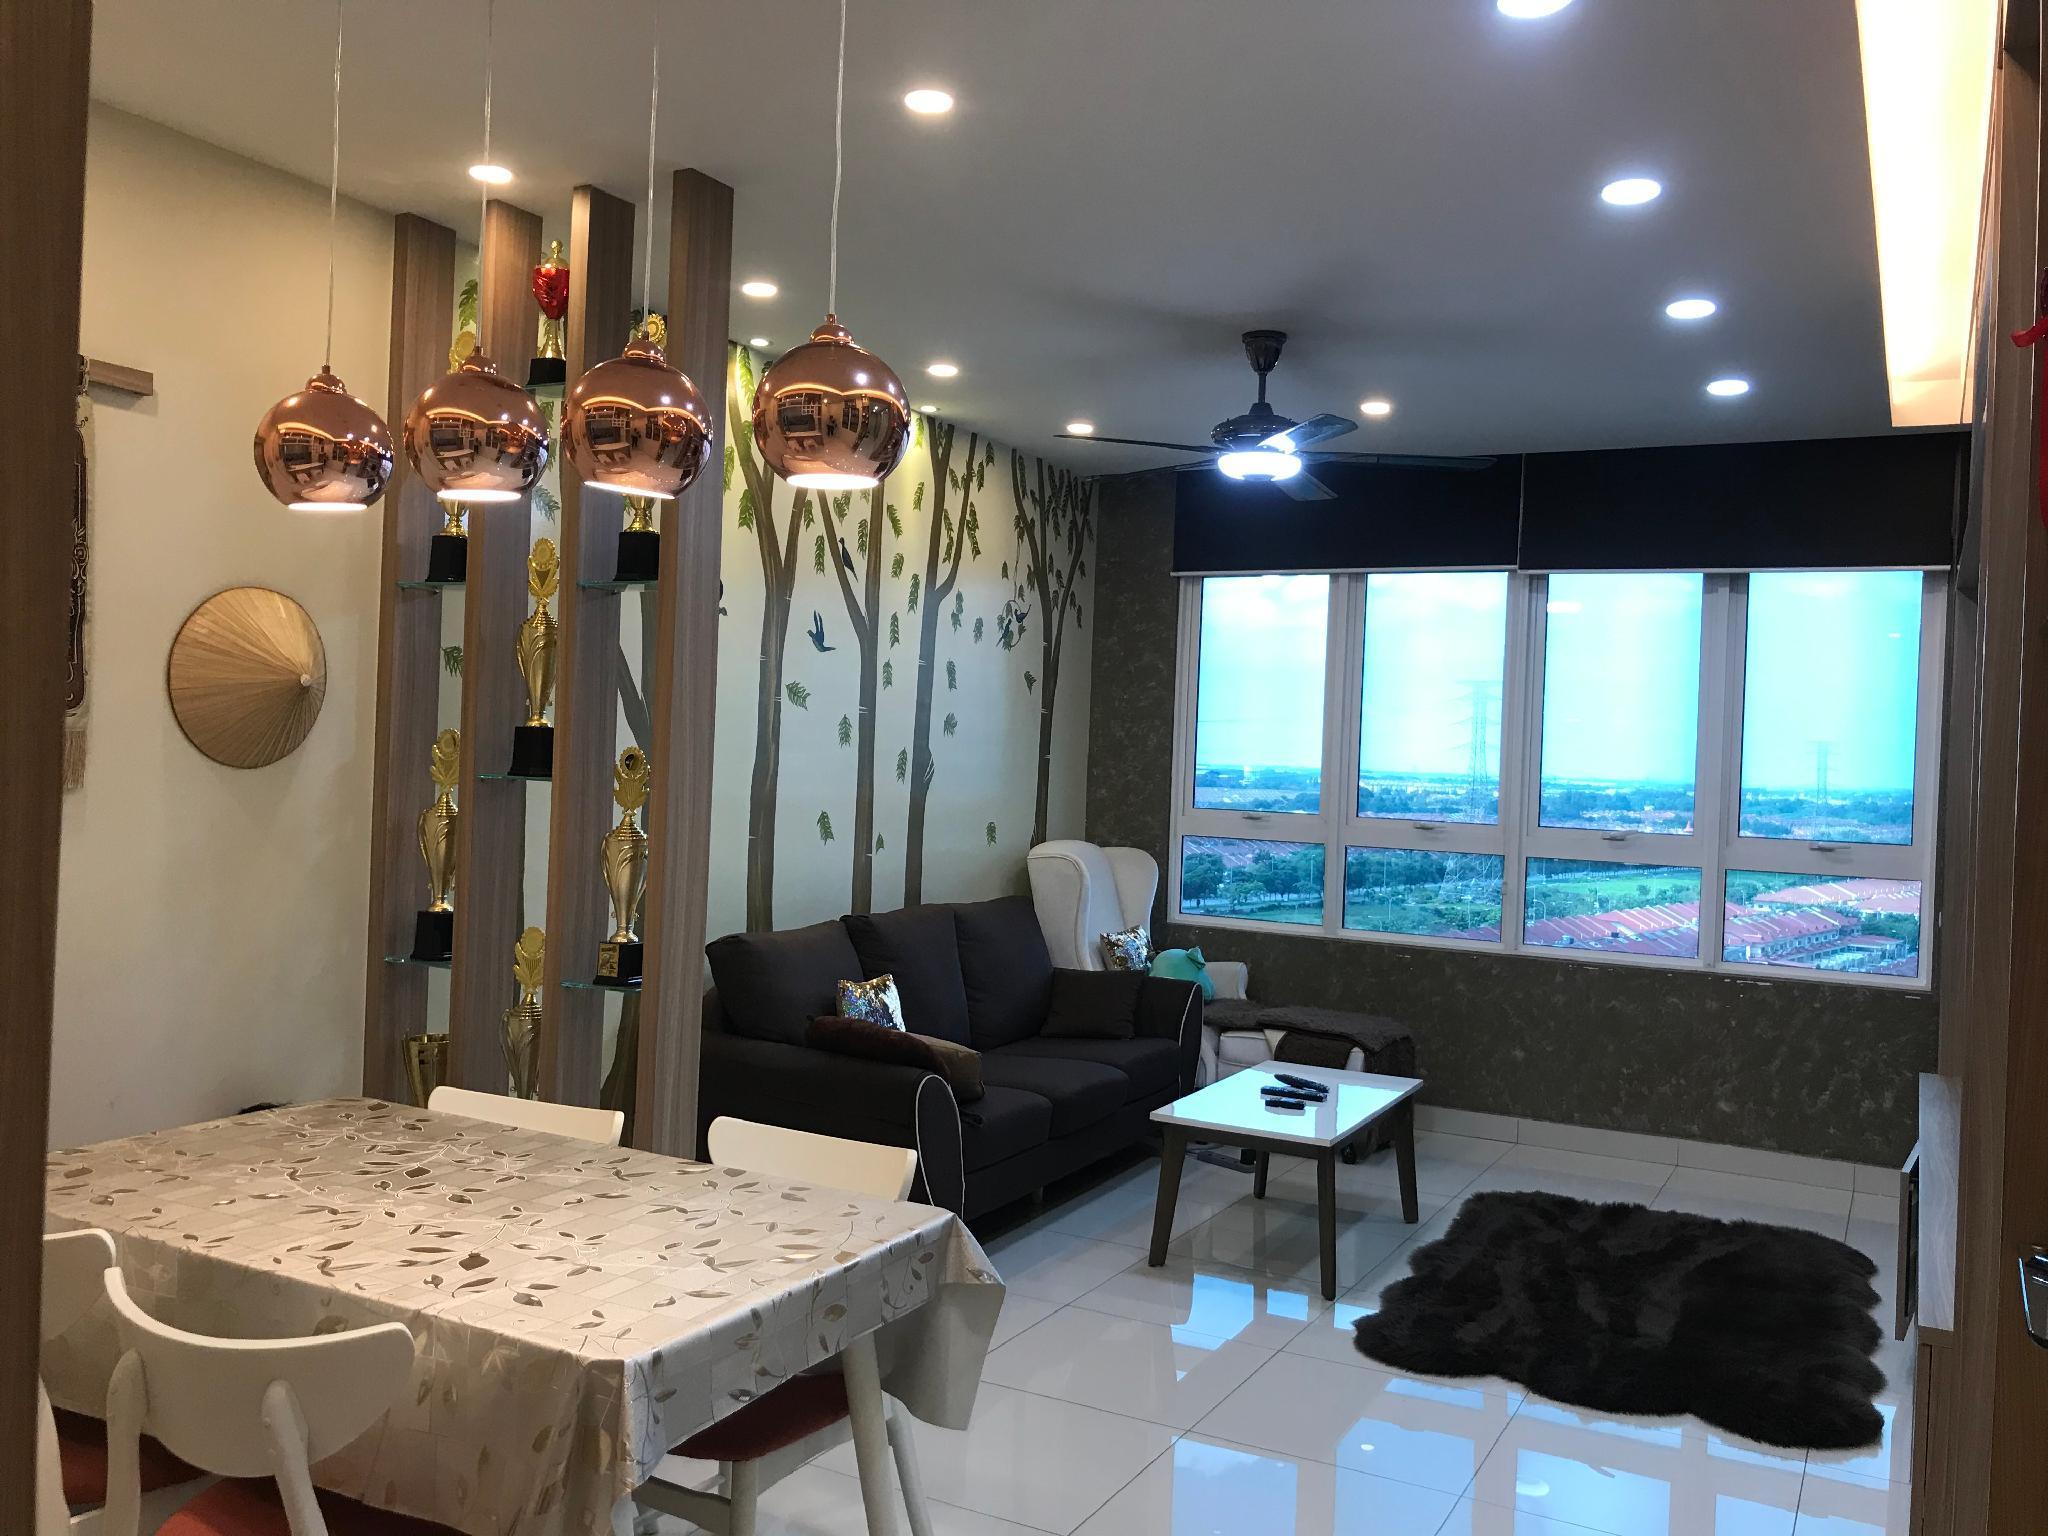 Luxurious And Comfy Dreamy Condominium